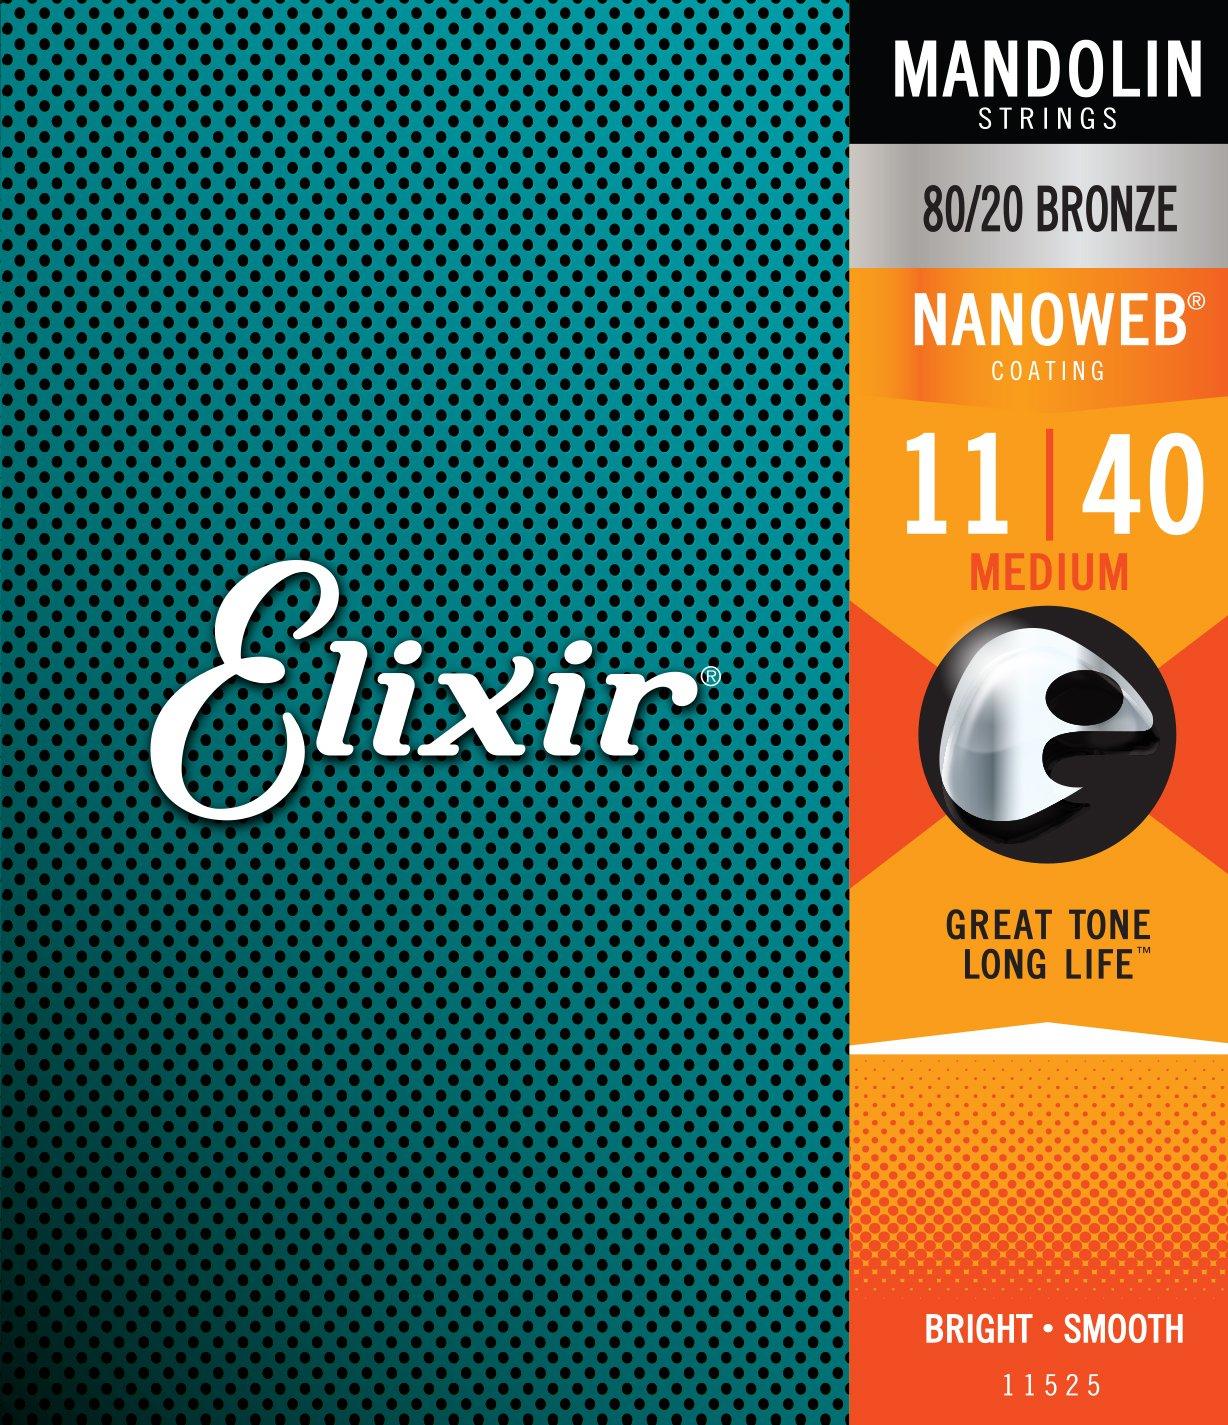 Elixir 11525 Nanoweb 80/20 Bronze Mandolin Strings, Medium, 11-40